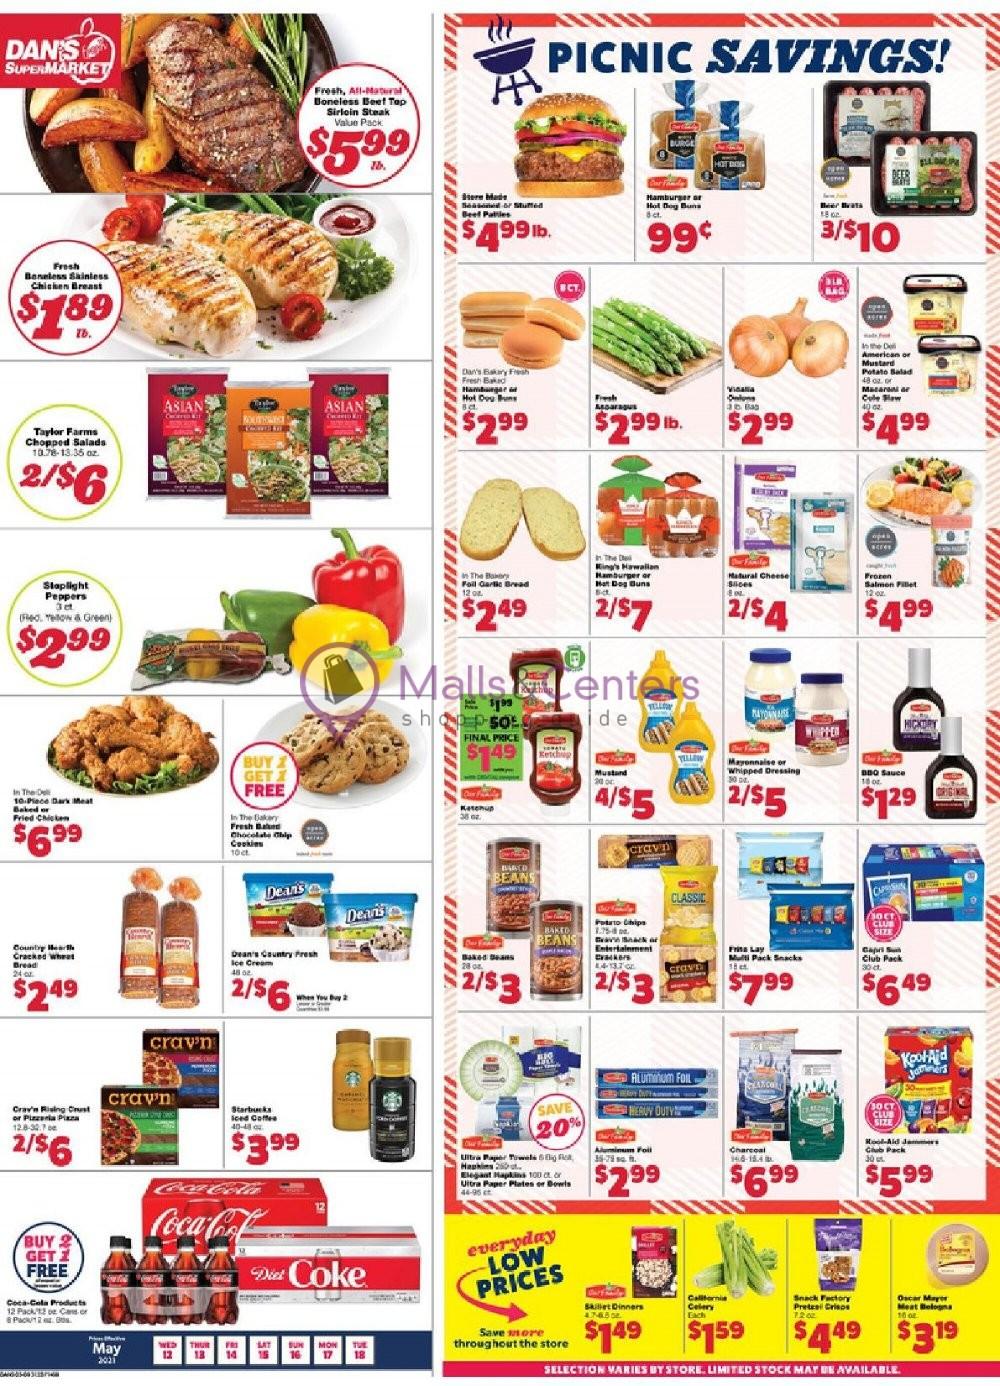 weekly ads Dan's fresh supermarket - page 1 - mallscenters.com